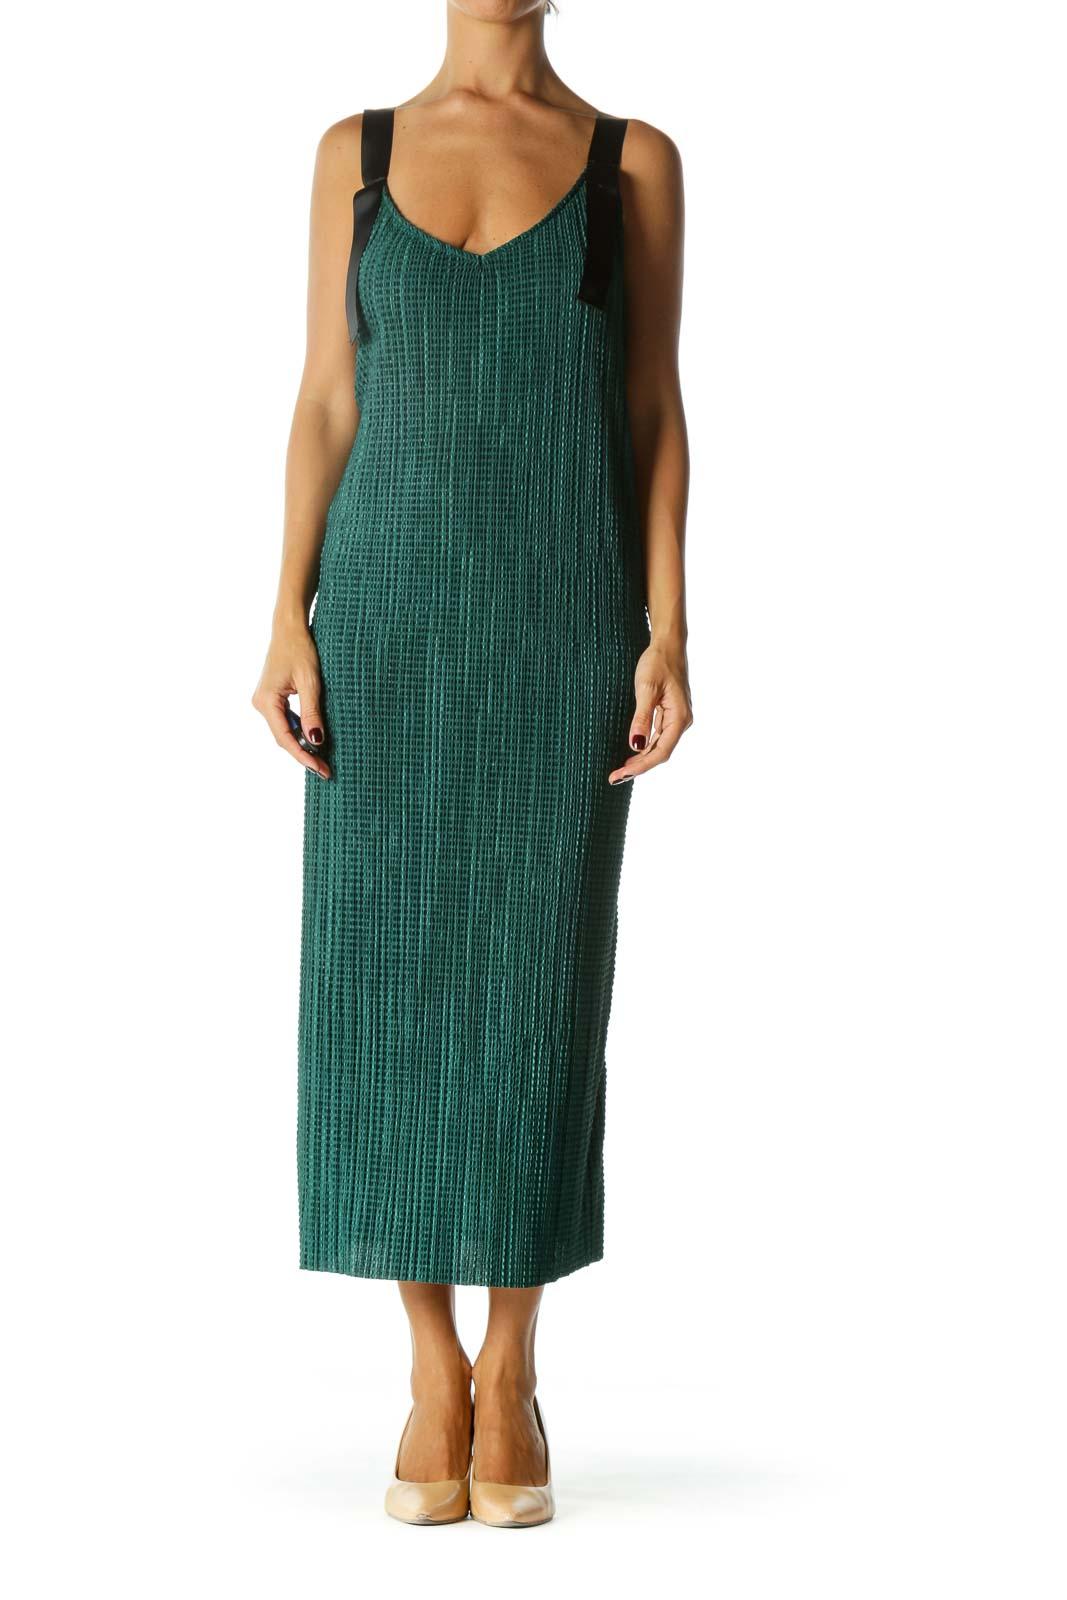 Emerald Green Black Knot Straps V-Neck Waffle Texture Stretch Dress